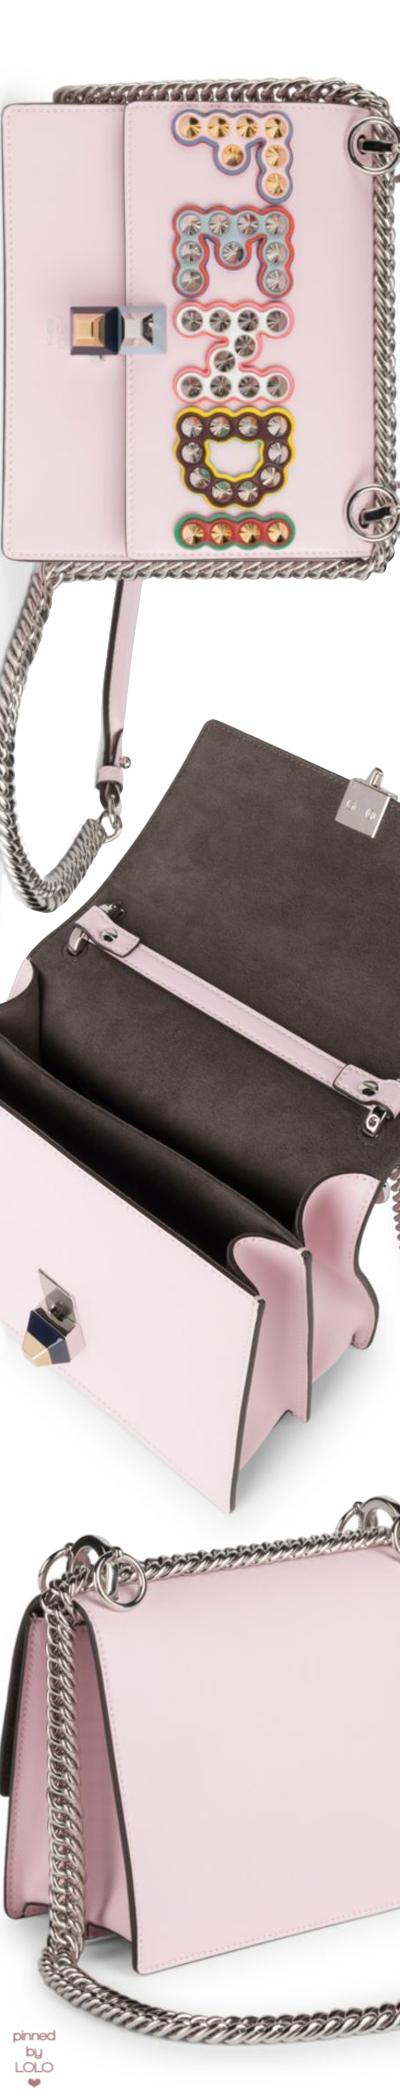 Fendi Mini Kan I Studded Leather Crossbody Bag